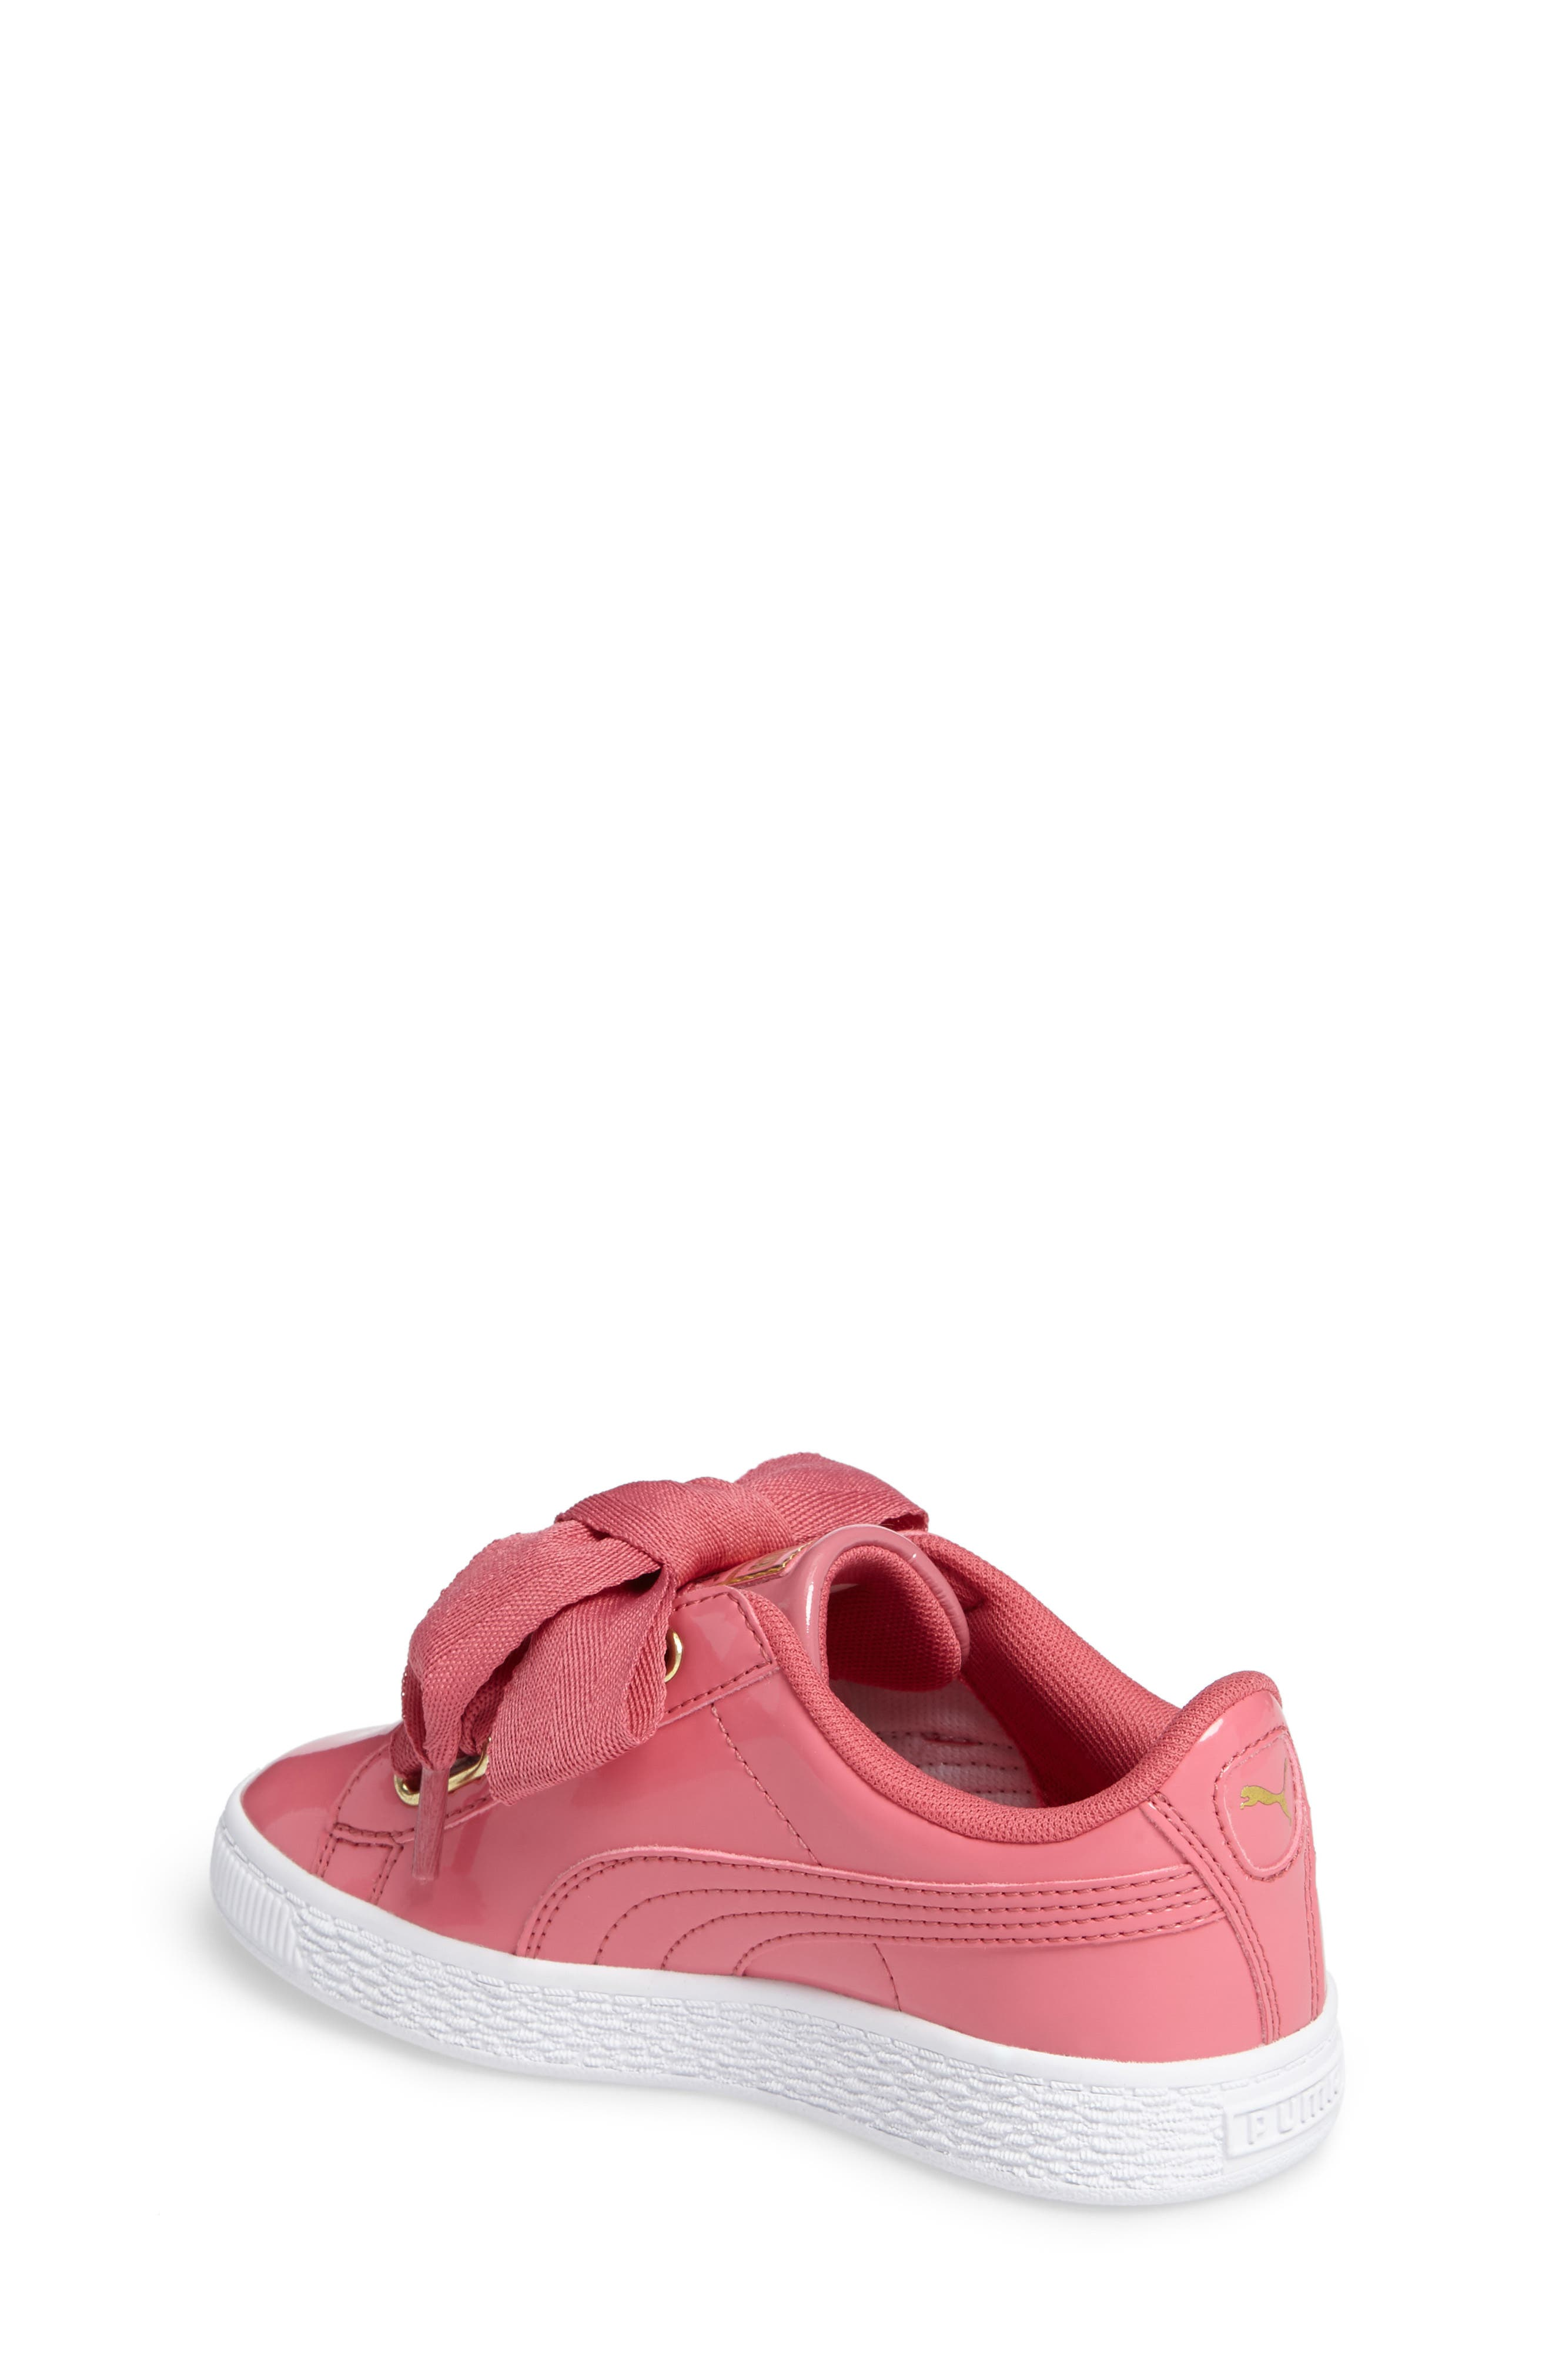 Basket Heart Sneaker,                             Alternate thumbnail 2, color,                             Rapture Rose/ Puma Team Gold